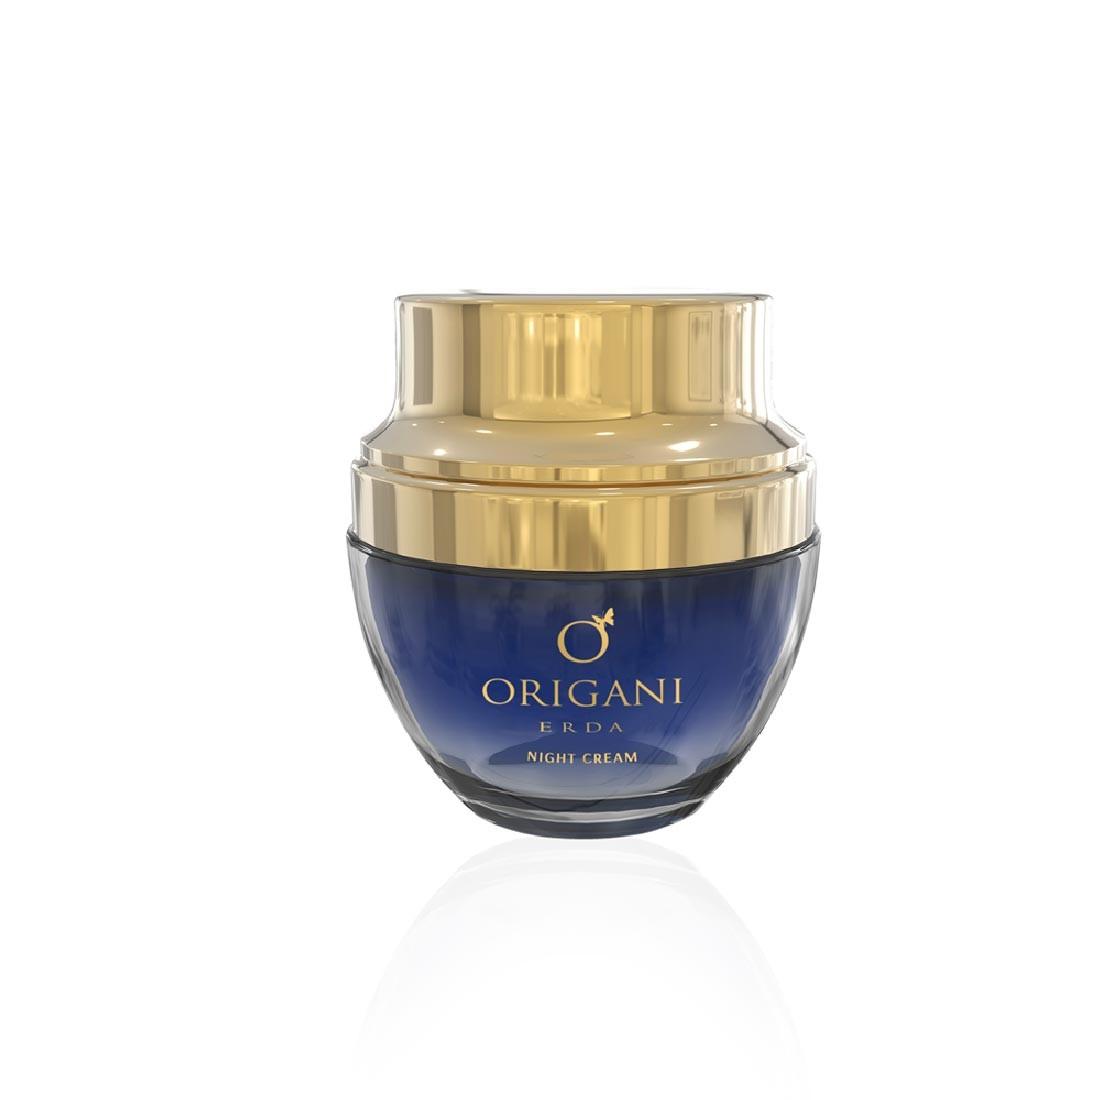 origani-erda-soothing-reviving-night-cream